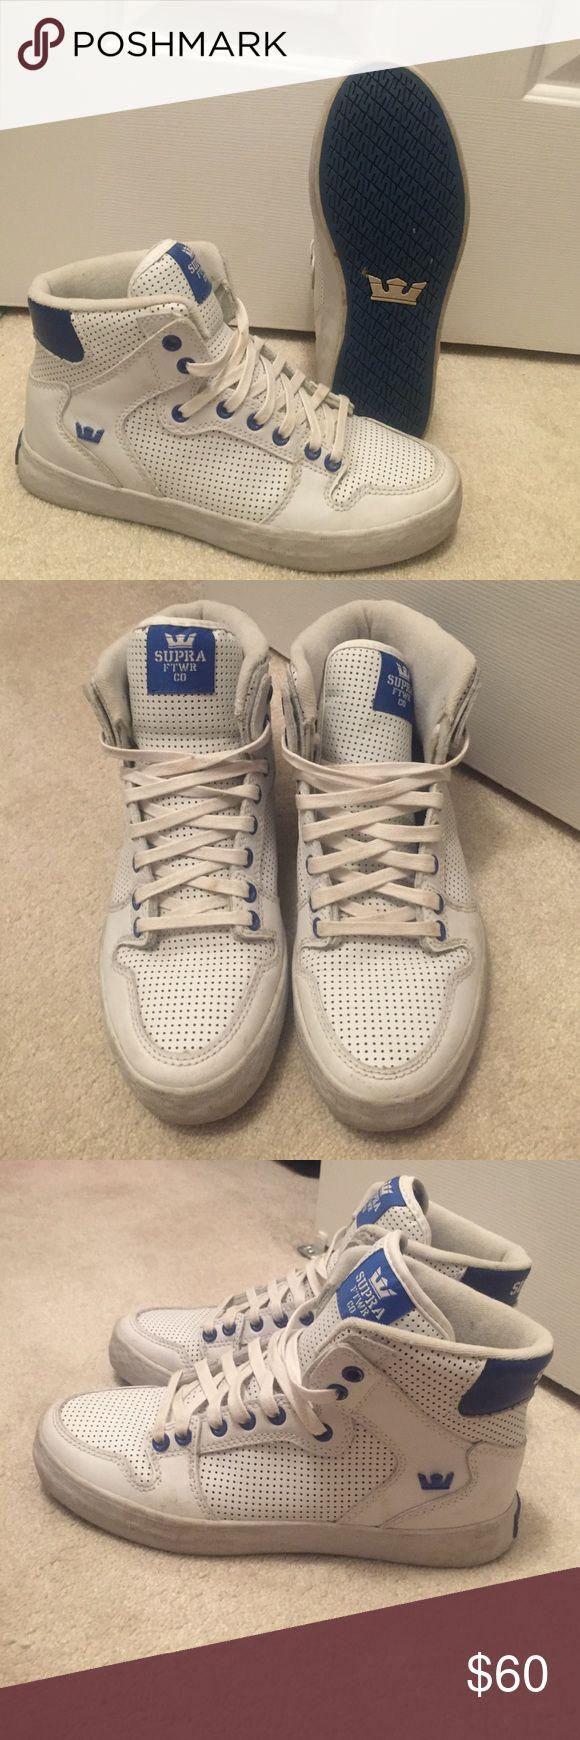 Men's supra high tops Barely worn white high top supra Supra Shoes Sneakers